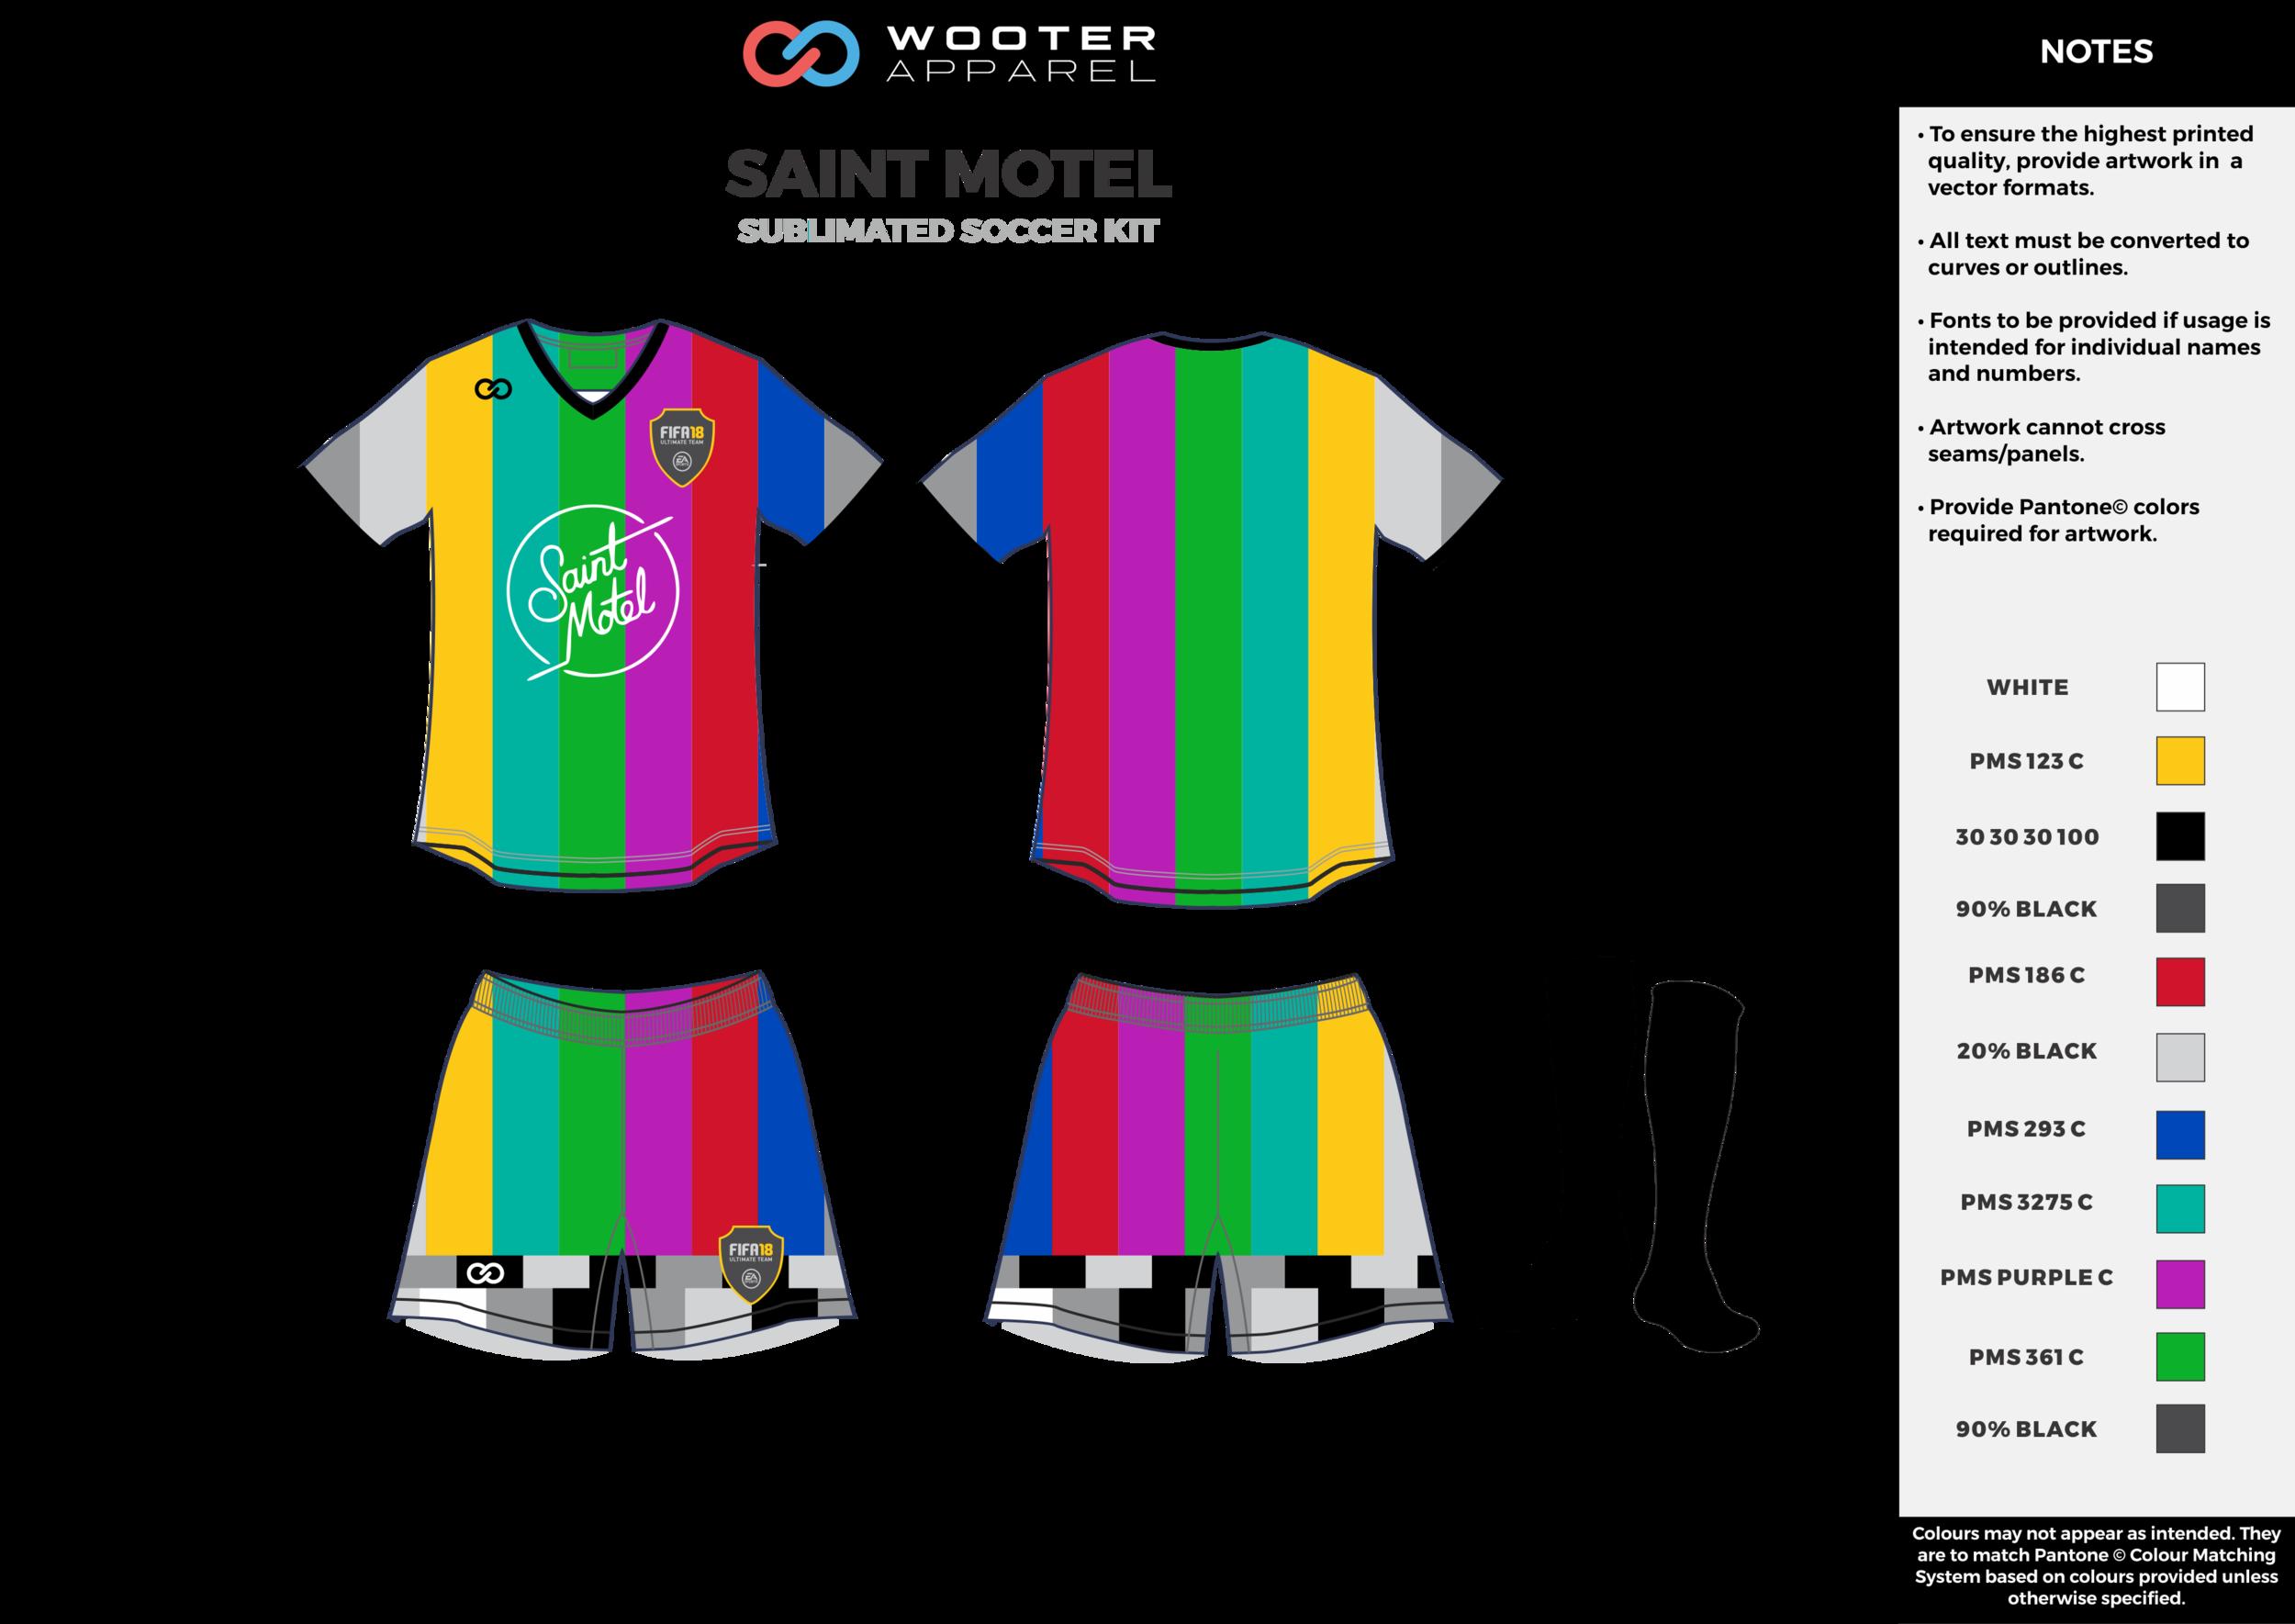 SAINT MOTEL rainbow color custom sublimated soccer uniform jersey shirt shorts socks